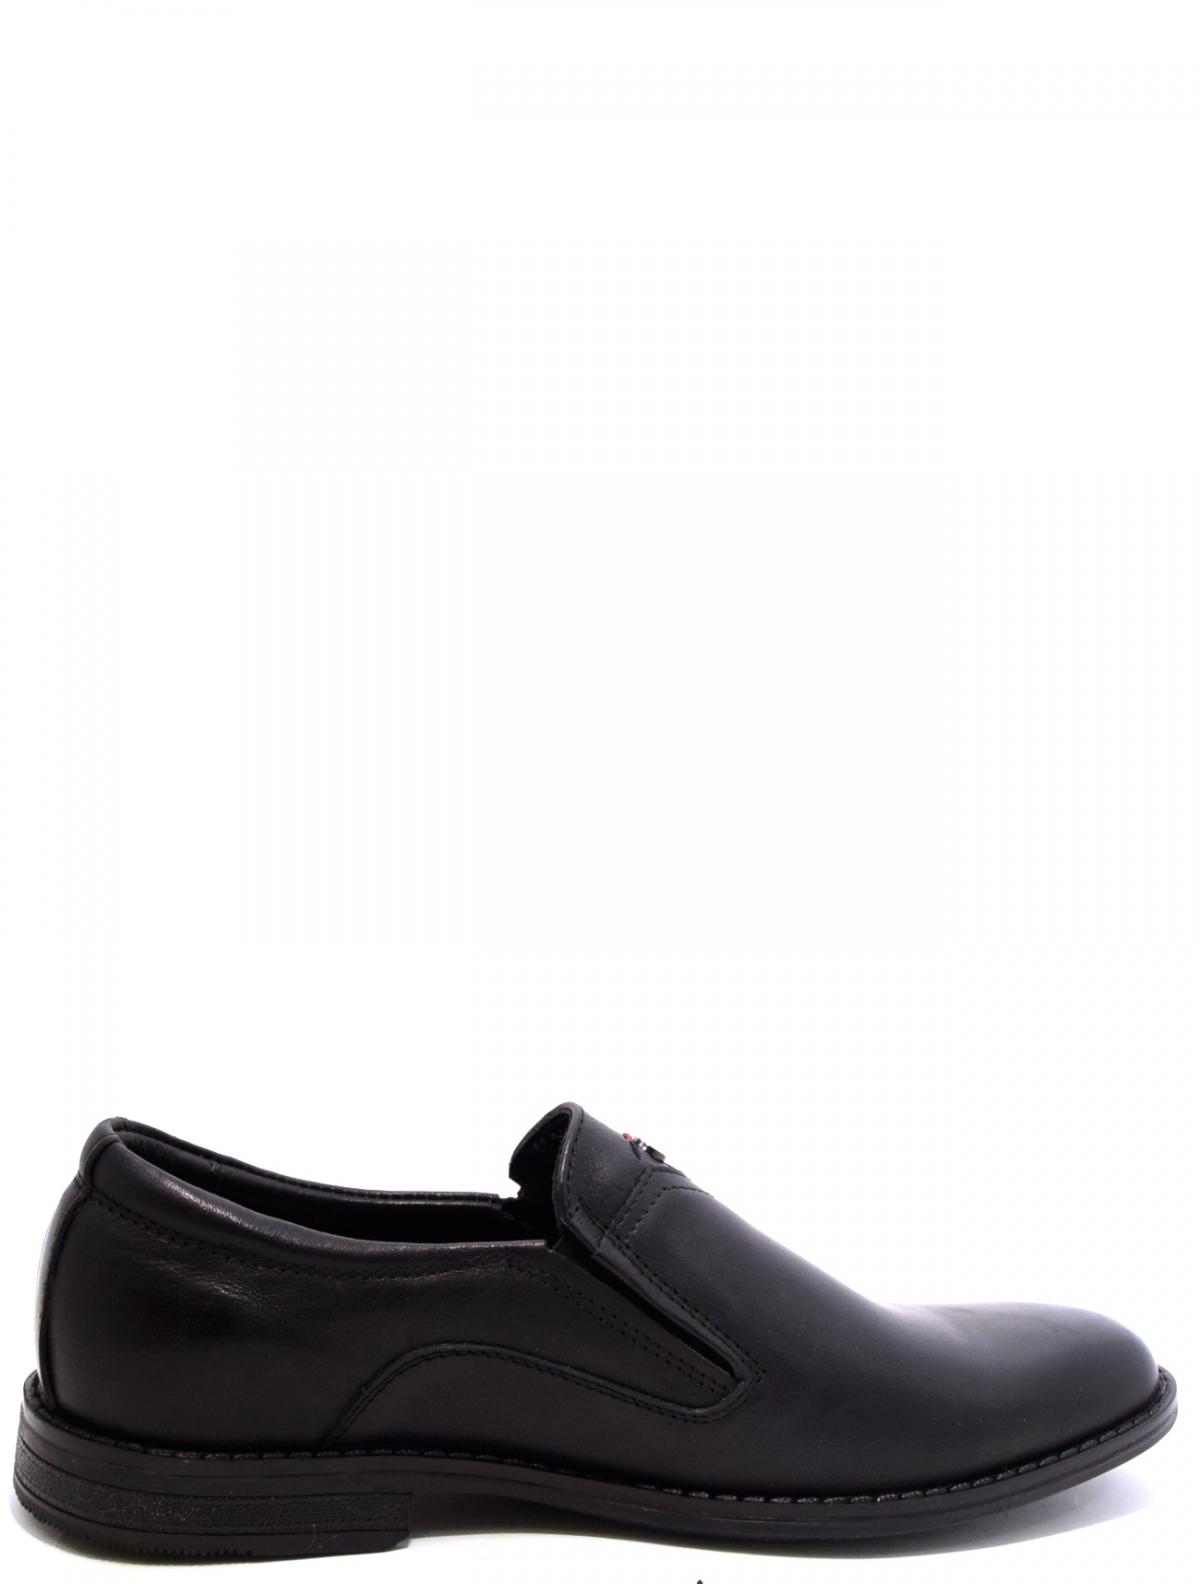 Spur SMC027-02-01-KK мужские туфли